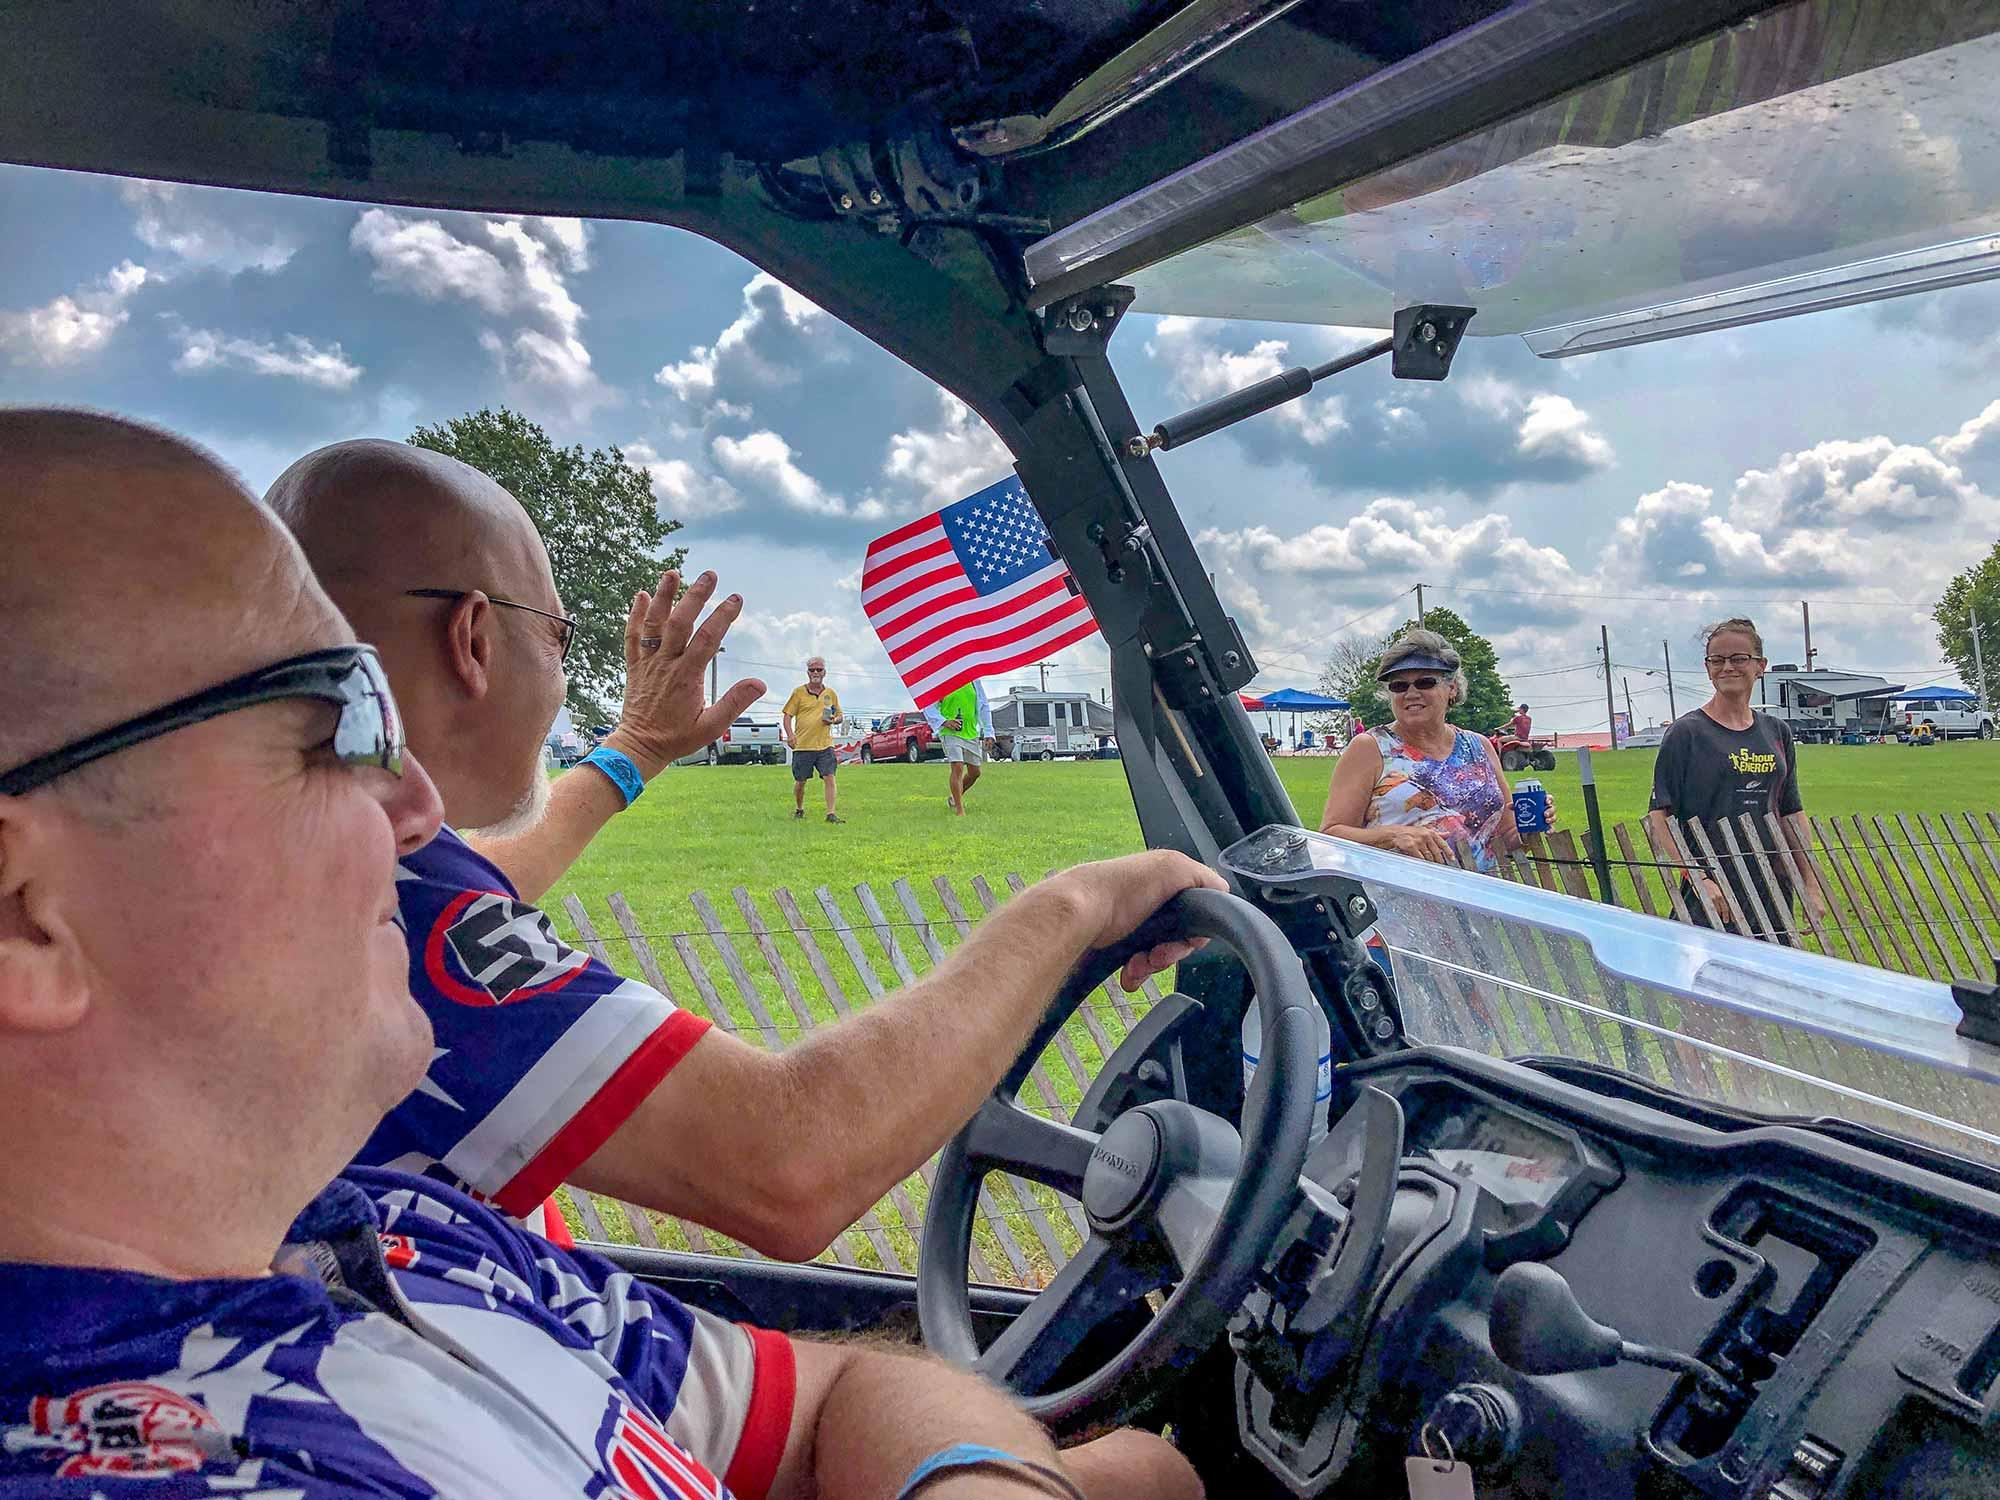 McMurray-Racing-Nashvill-Marine-2021-Springfield-F1-Race-41